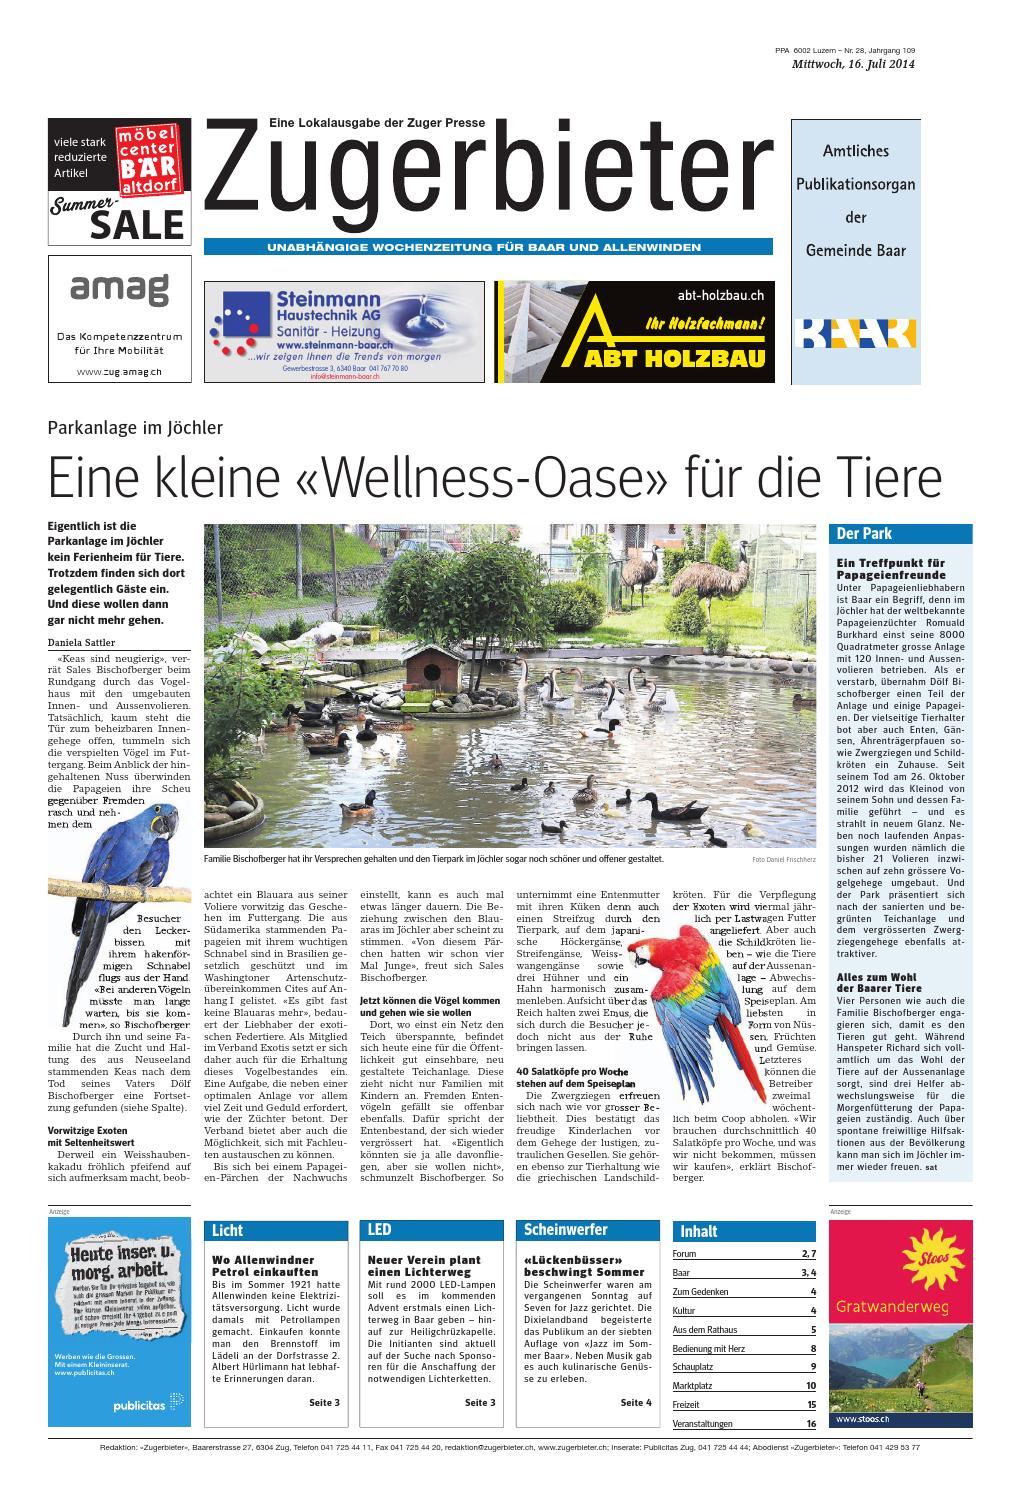 Zugerbieter 20140716 by Zuger Presse - Zugerbieter - issuu